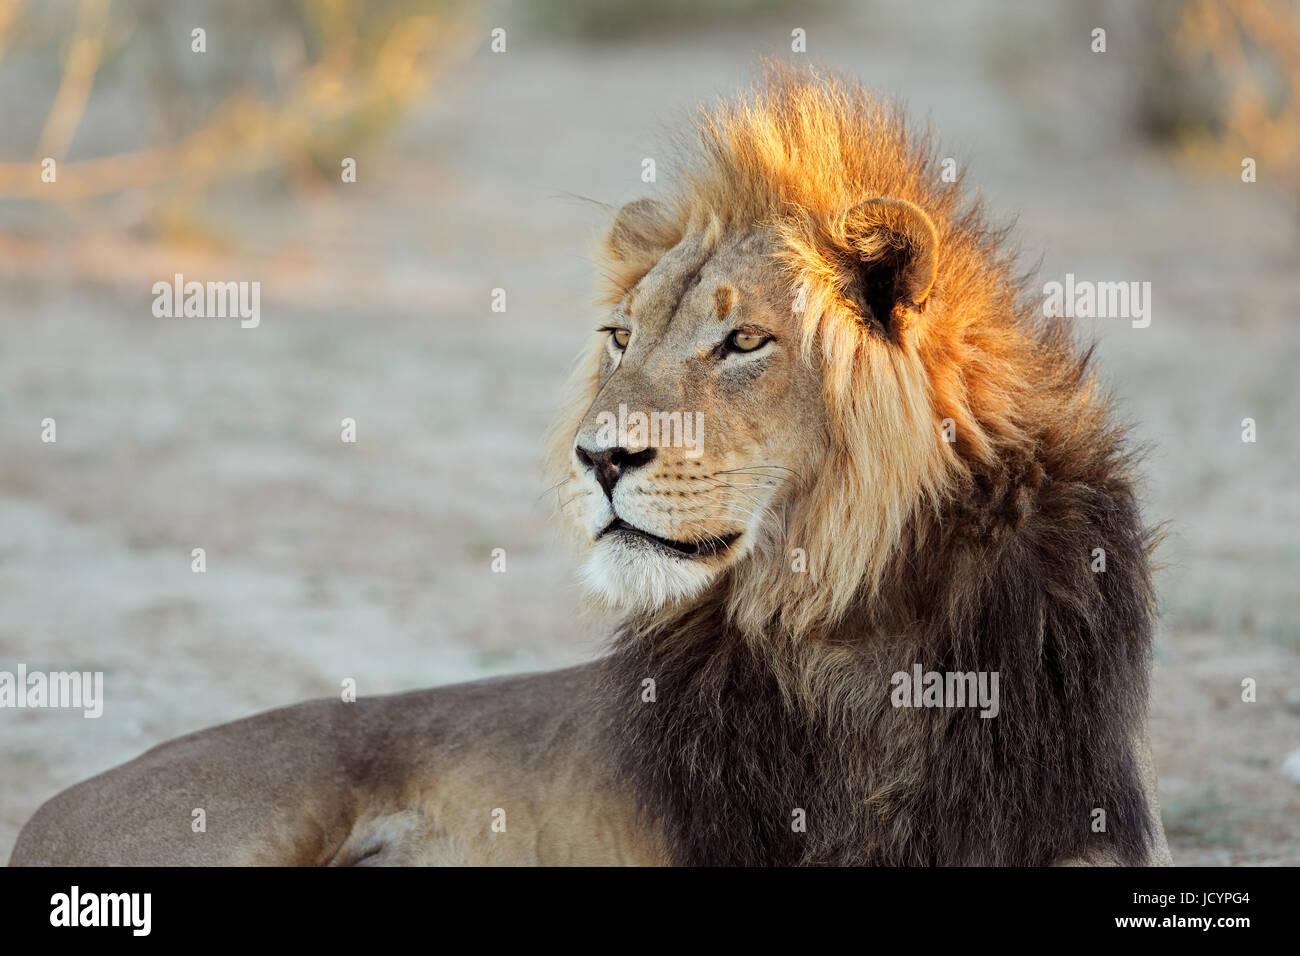 Retrato de un gran macho león africano (Panthera leo), Sudáfrica Imagen De Stock